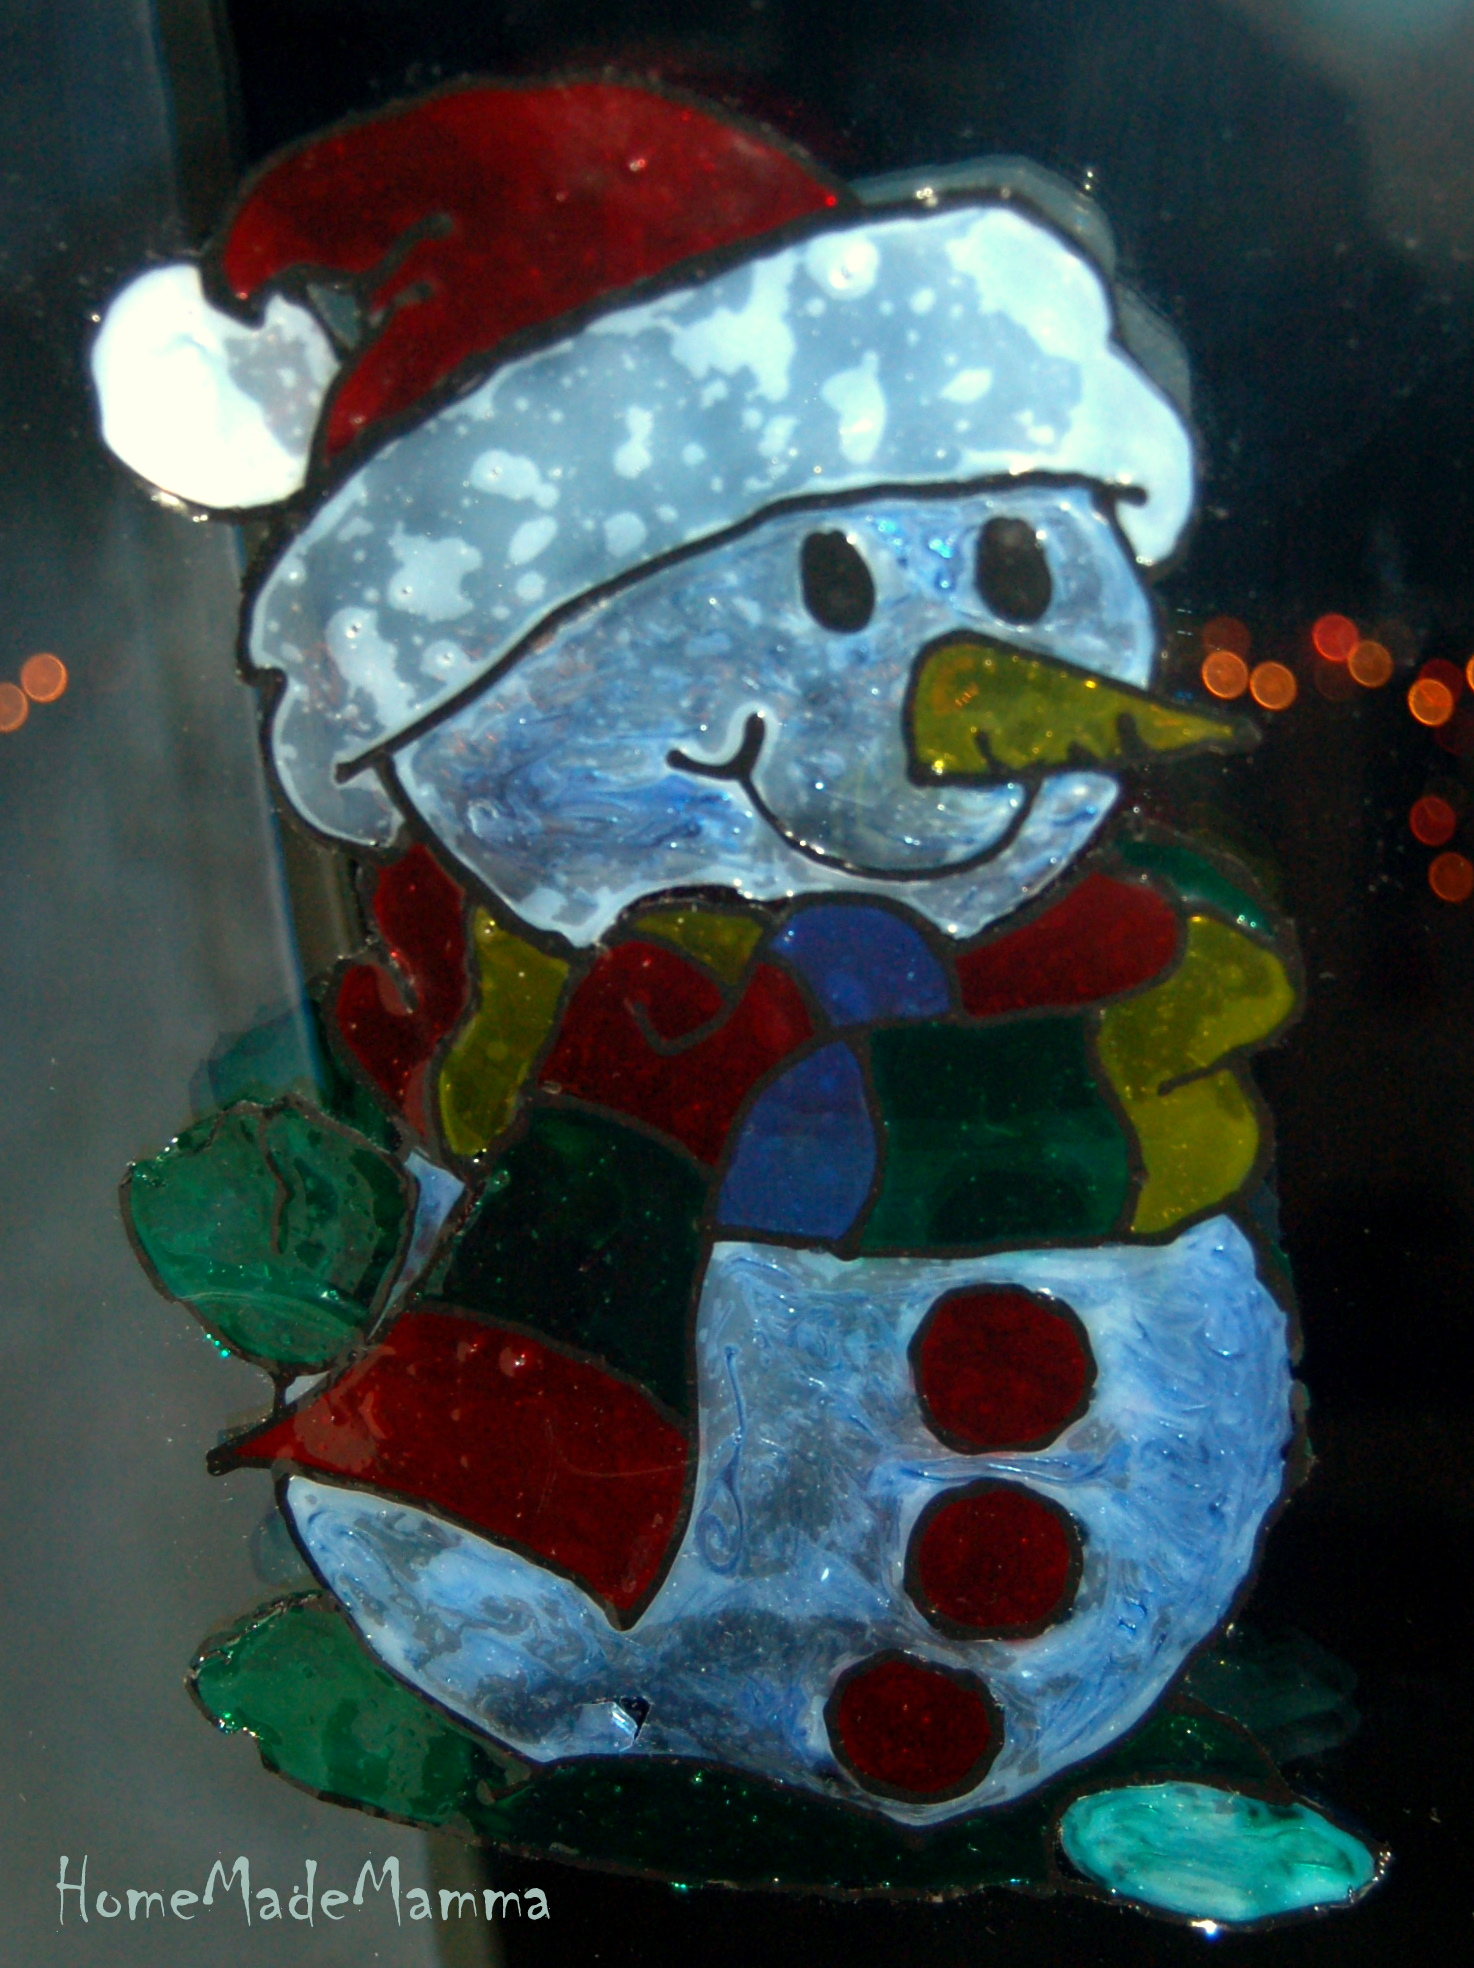 Disegni Di Natale Particolari.Alberelli Candele Renne Vetrofanie Natalizie Fai Da Te